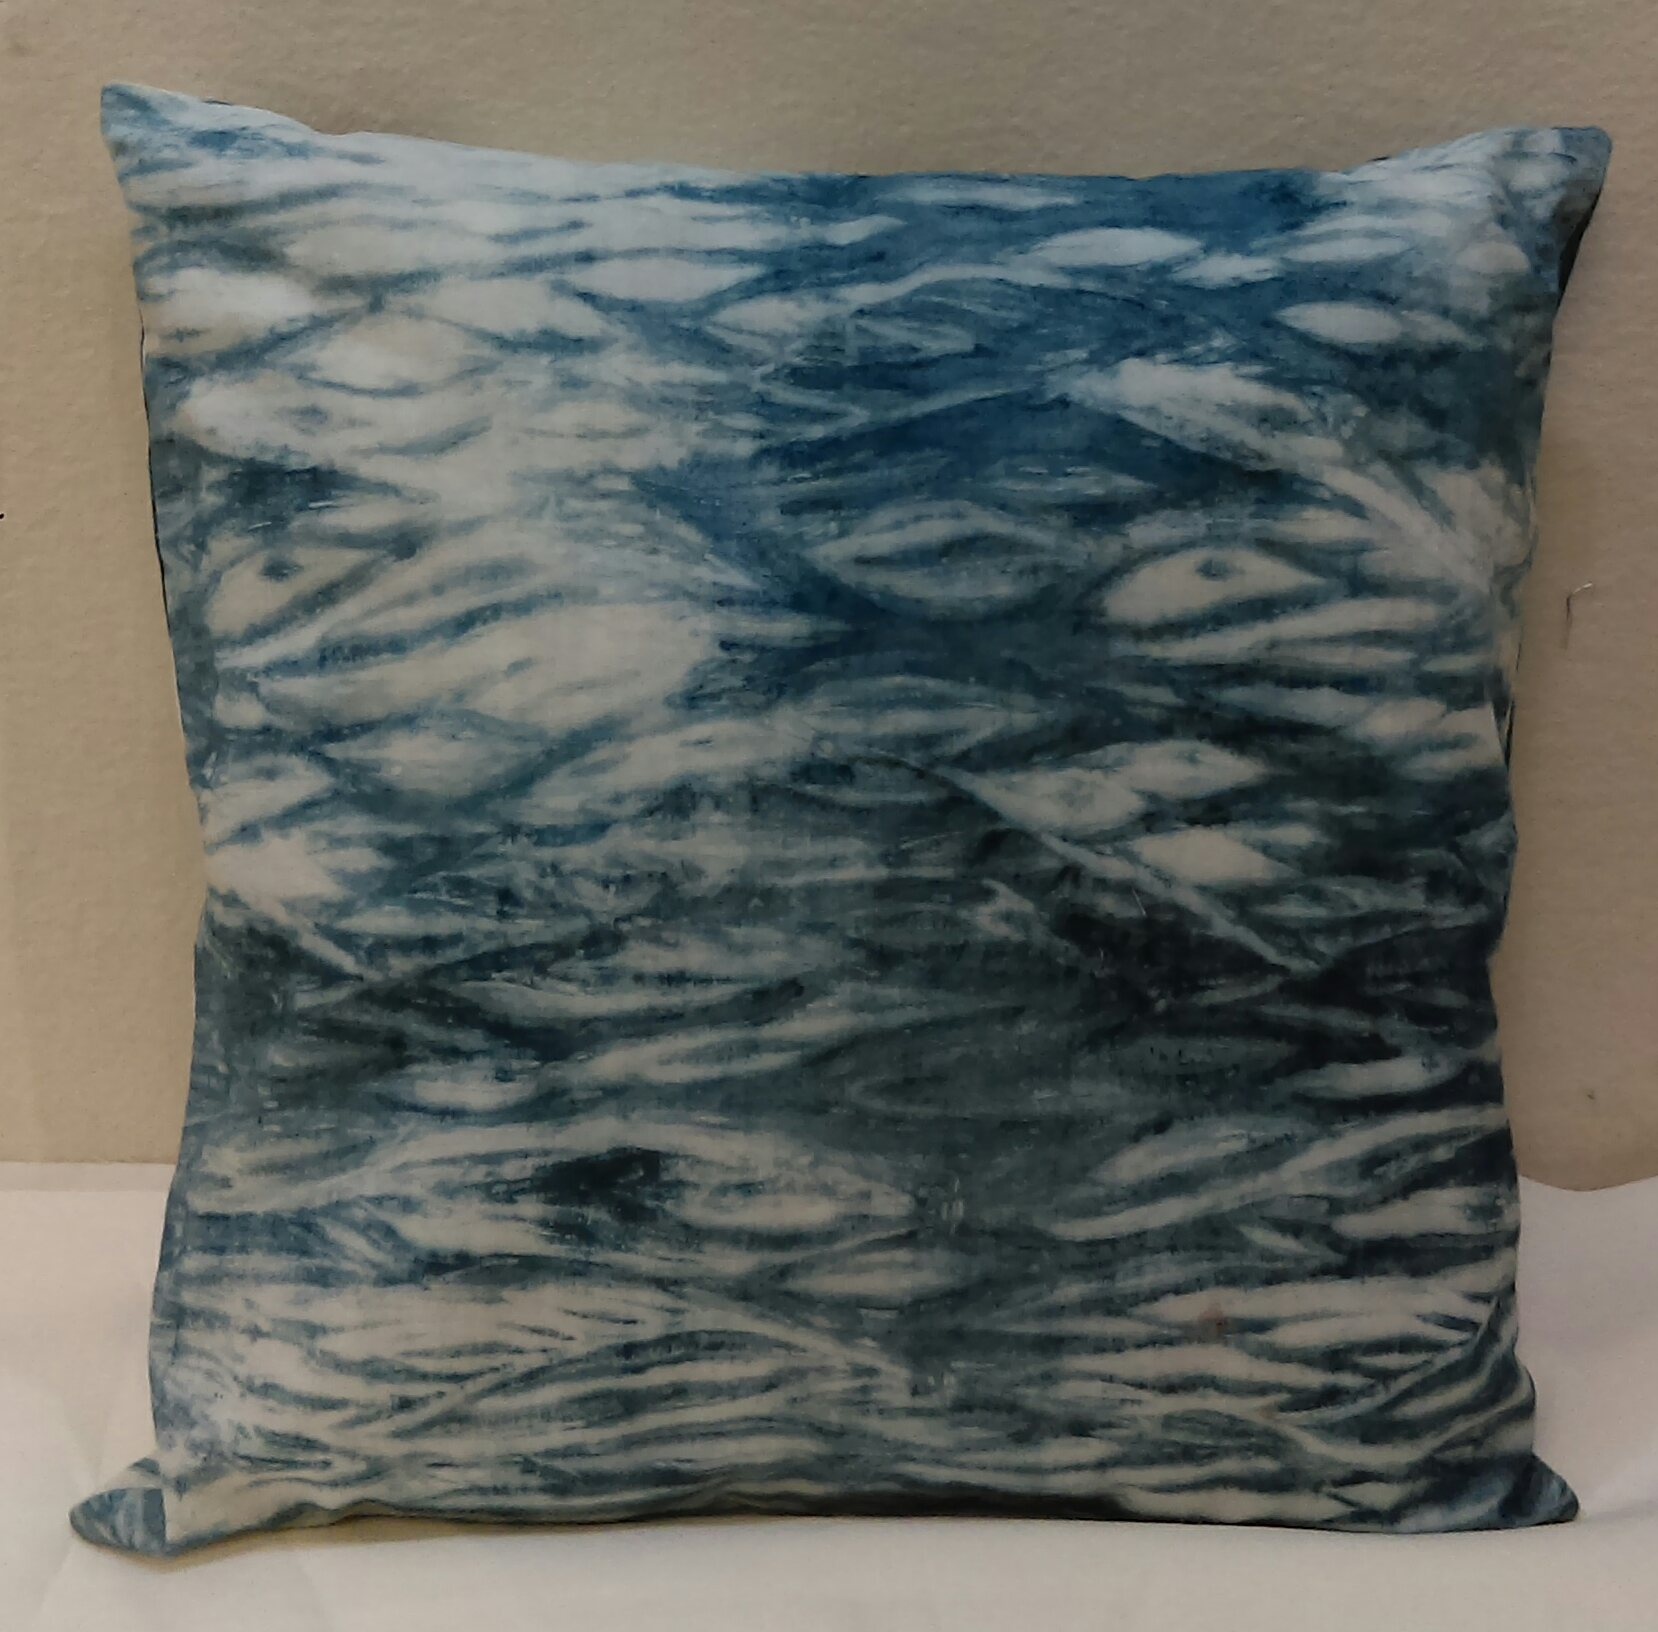 Shibori Pillow project for 2018 Sew Creative Camp